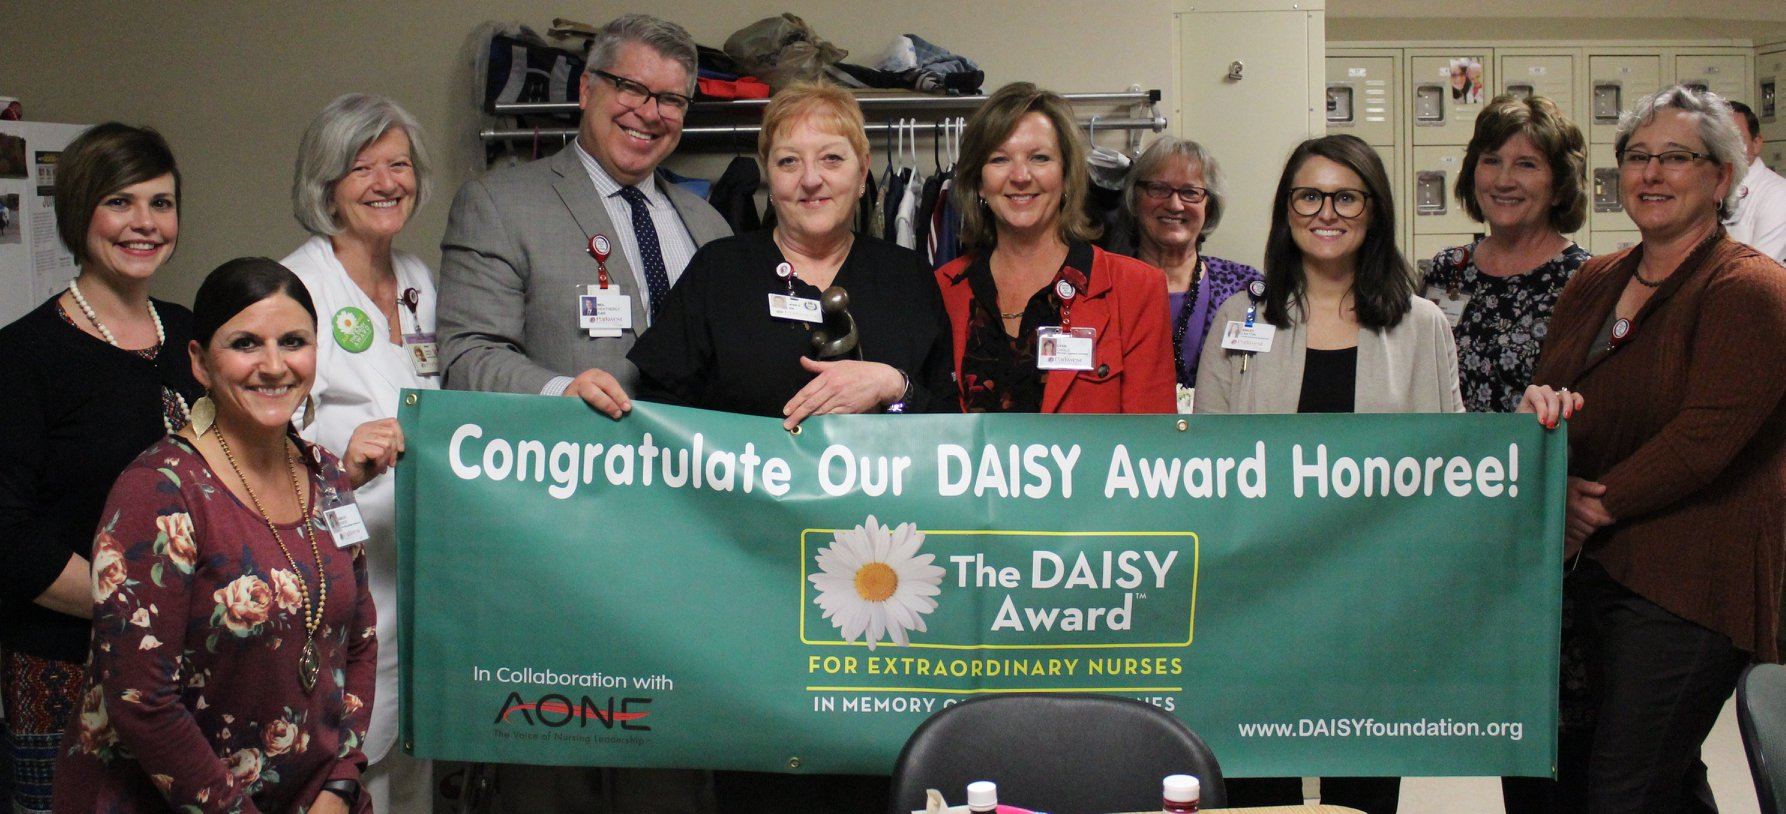 Daisy Award Winner Jodi Counts – are YOU next?